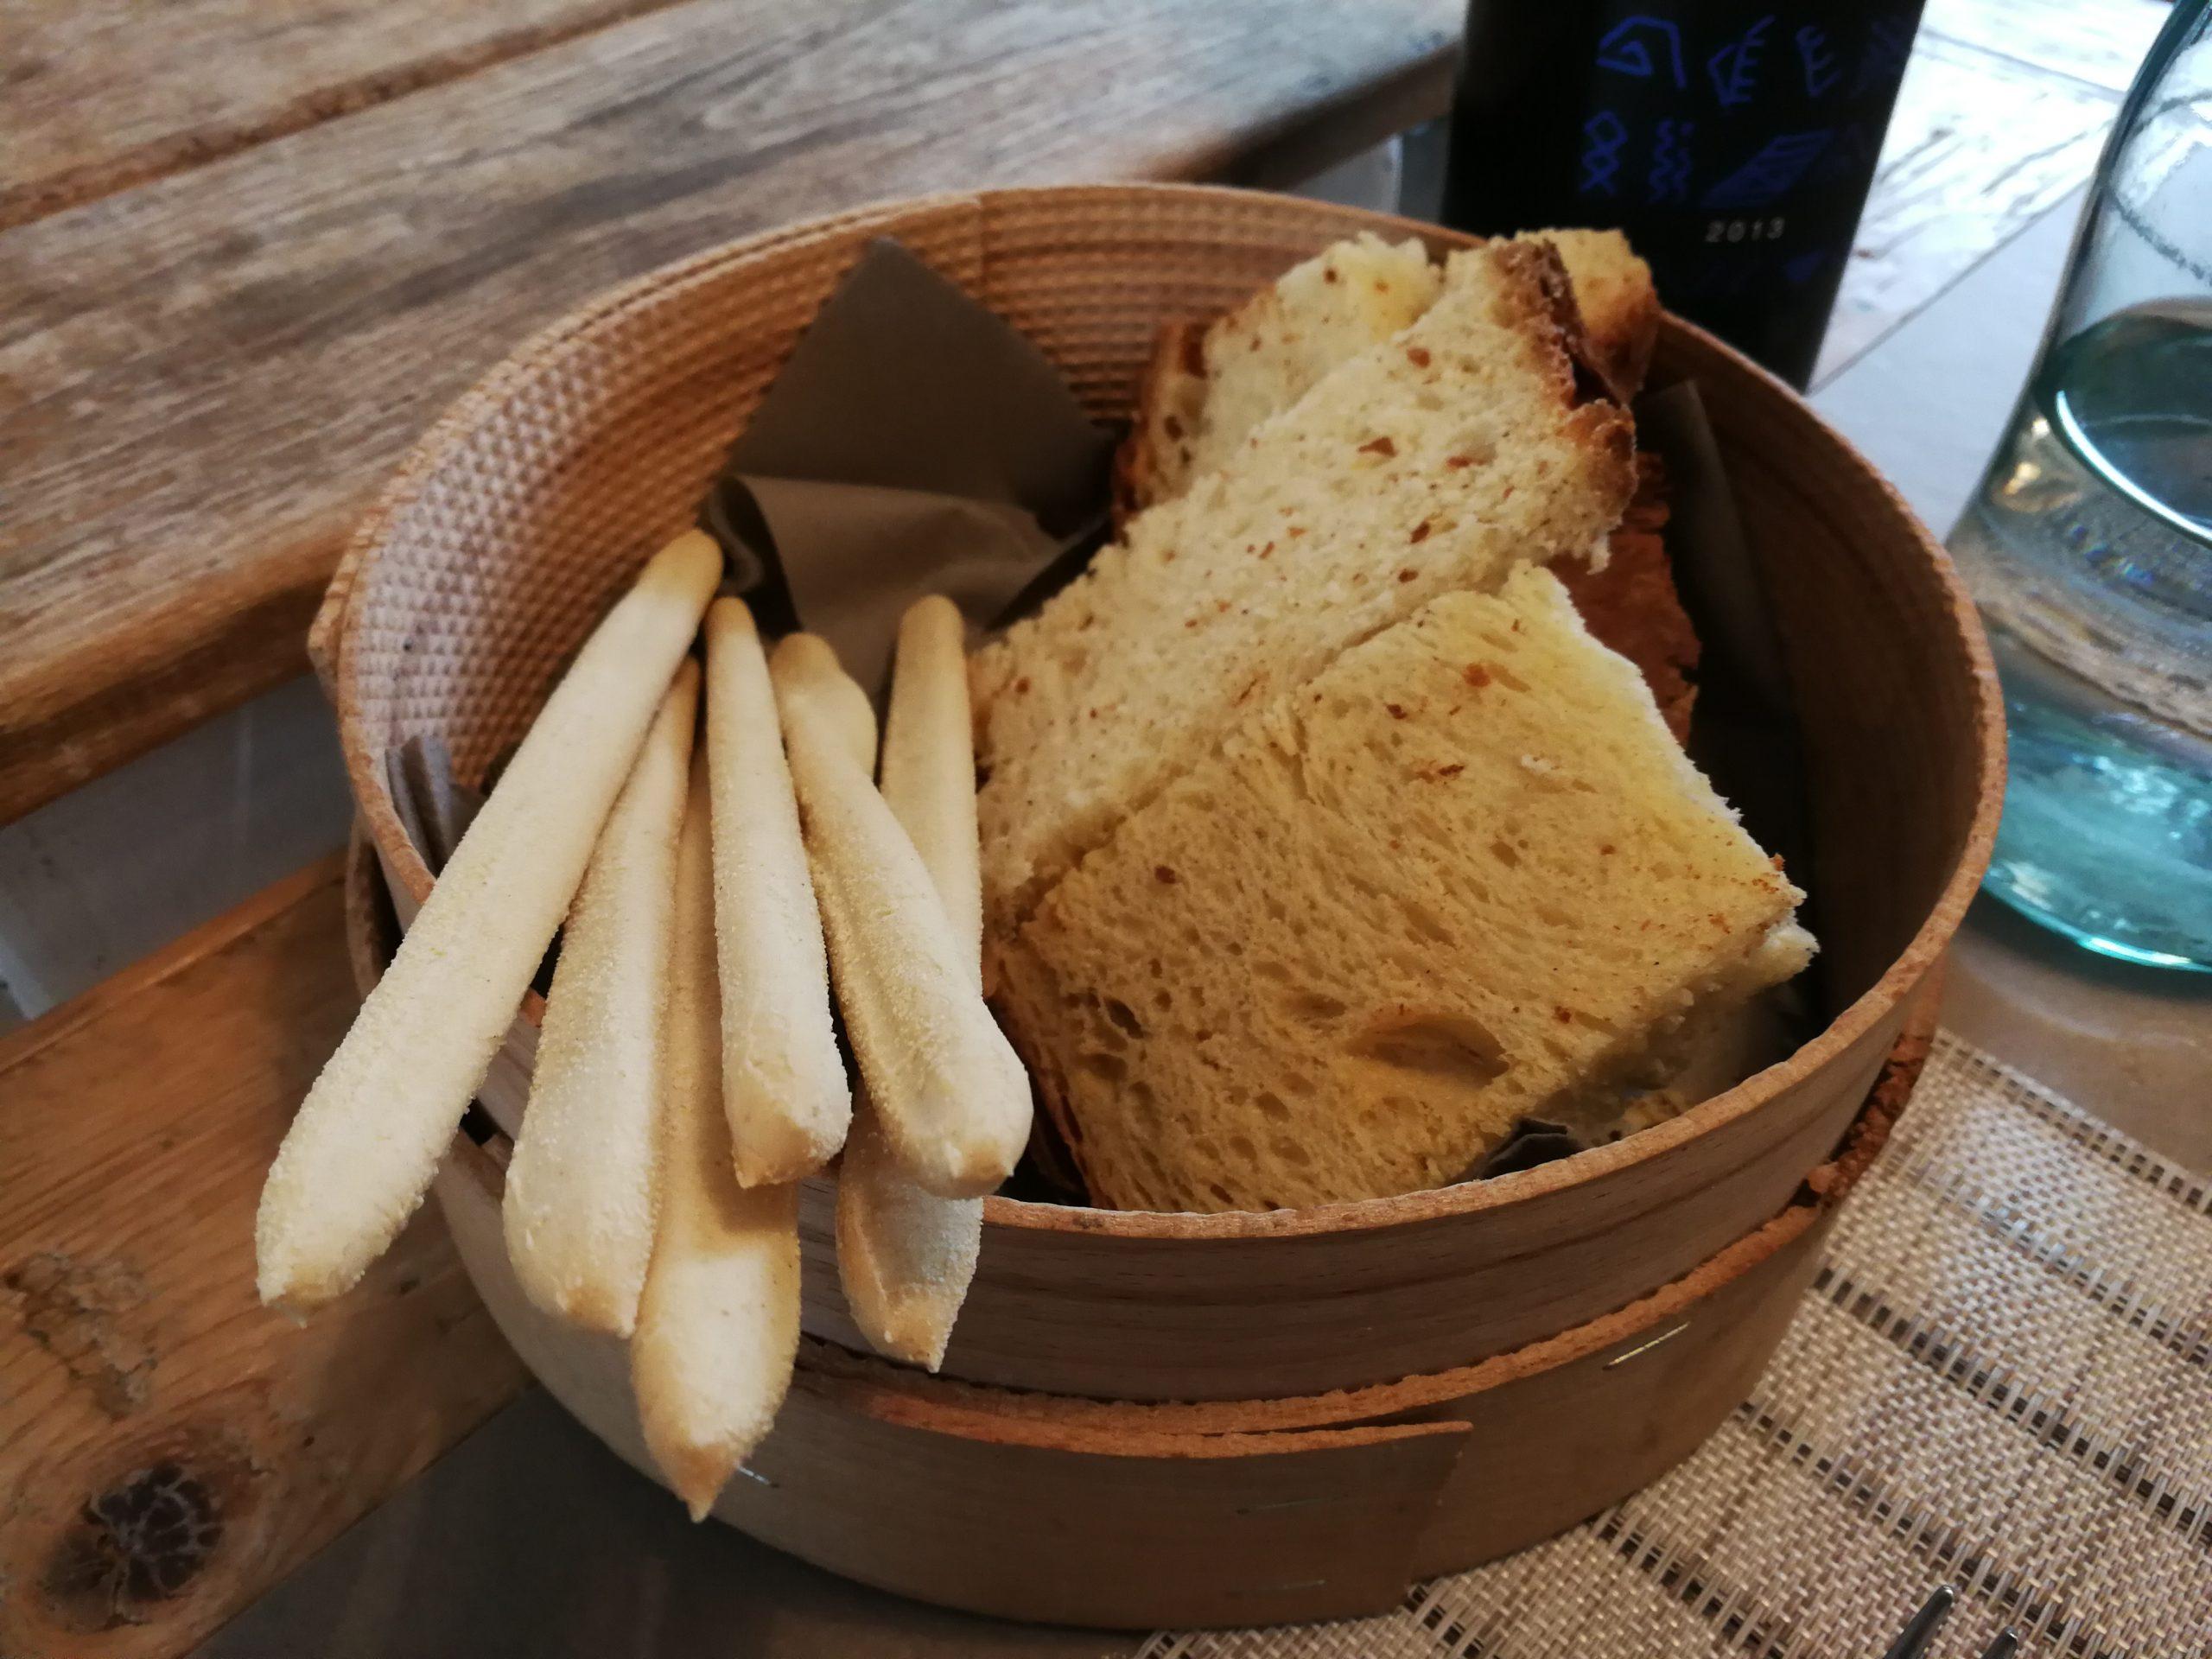 Pane, Carne, Tolin, Macelleria, Lozzo Atestino, Padova, Veneto